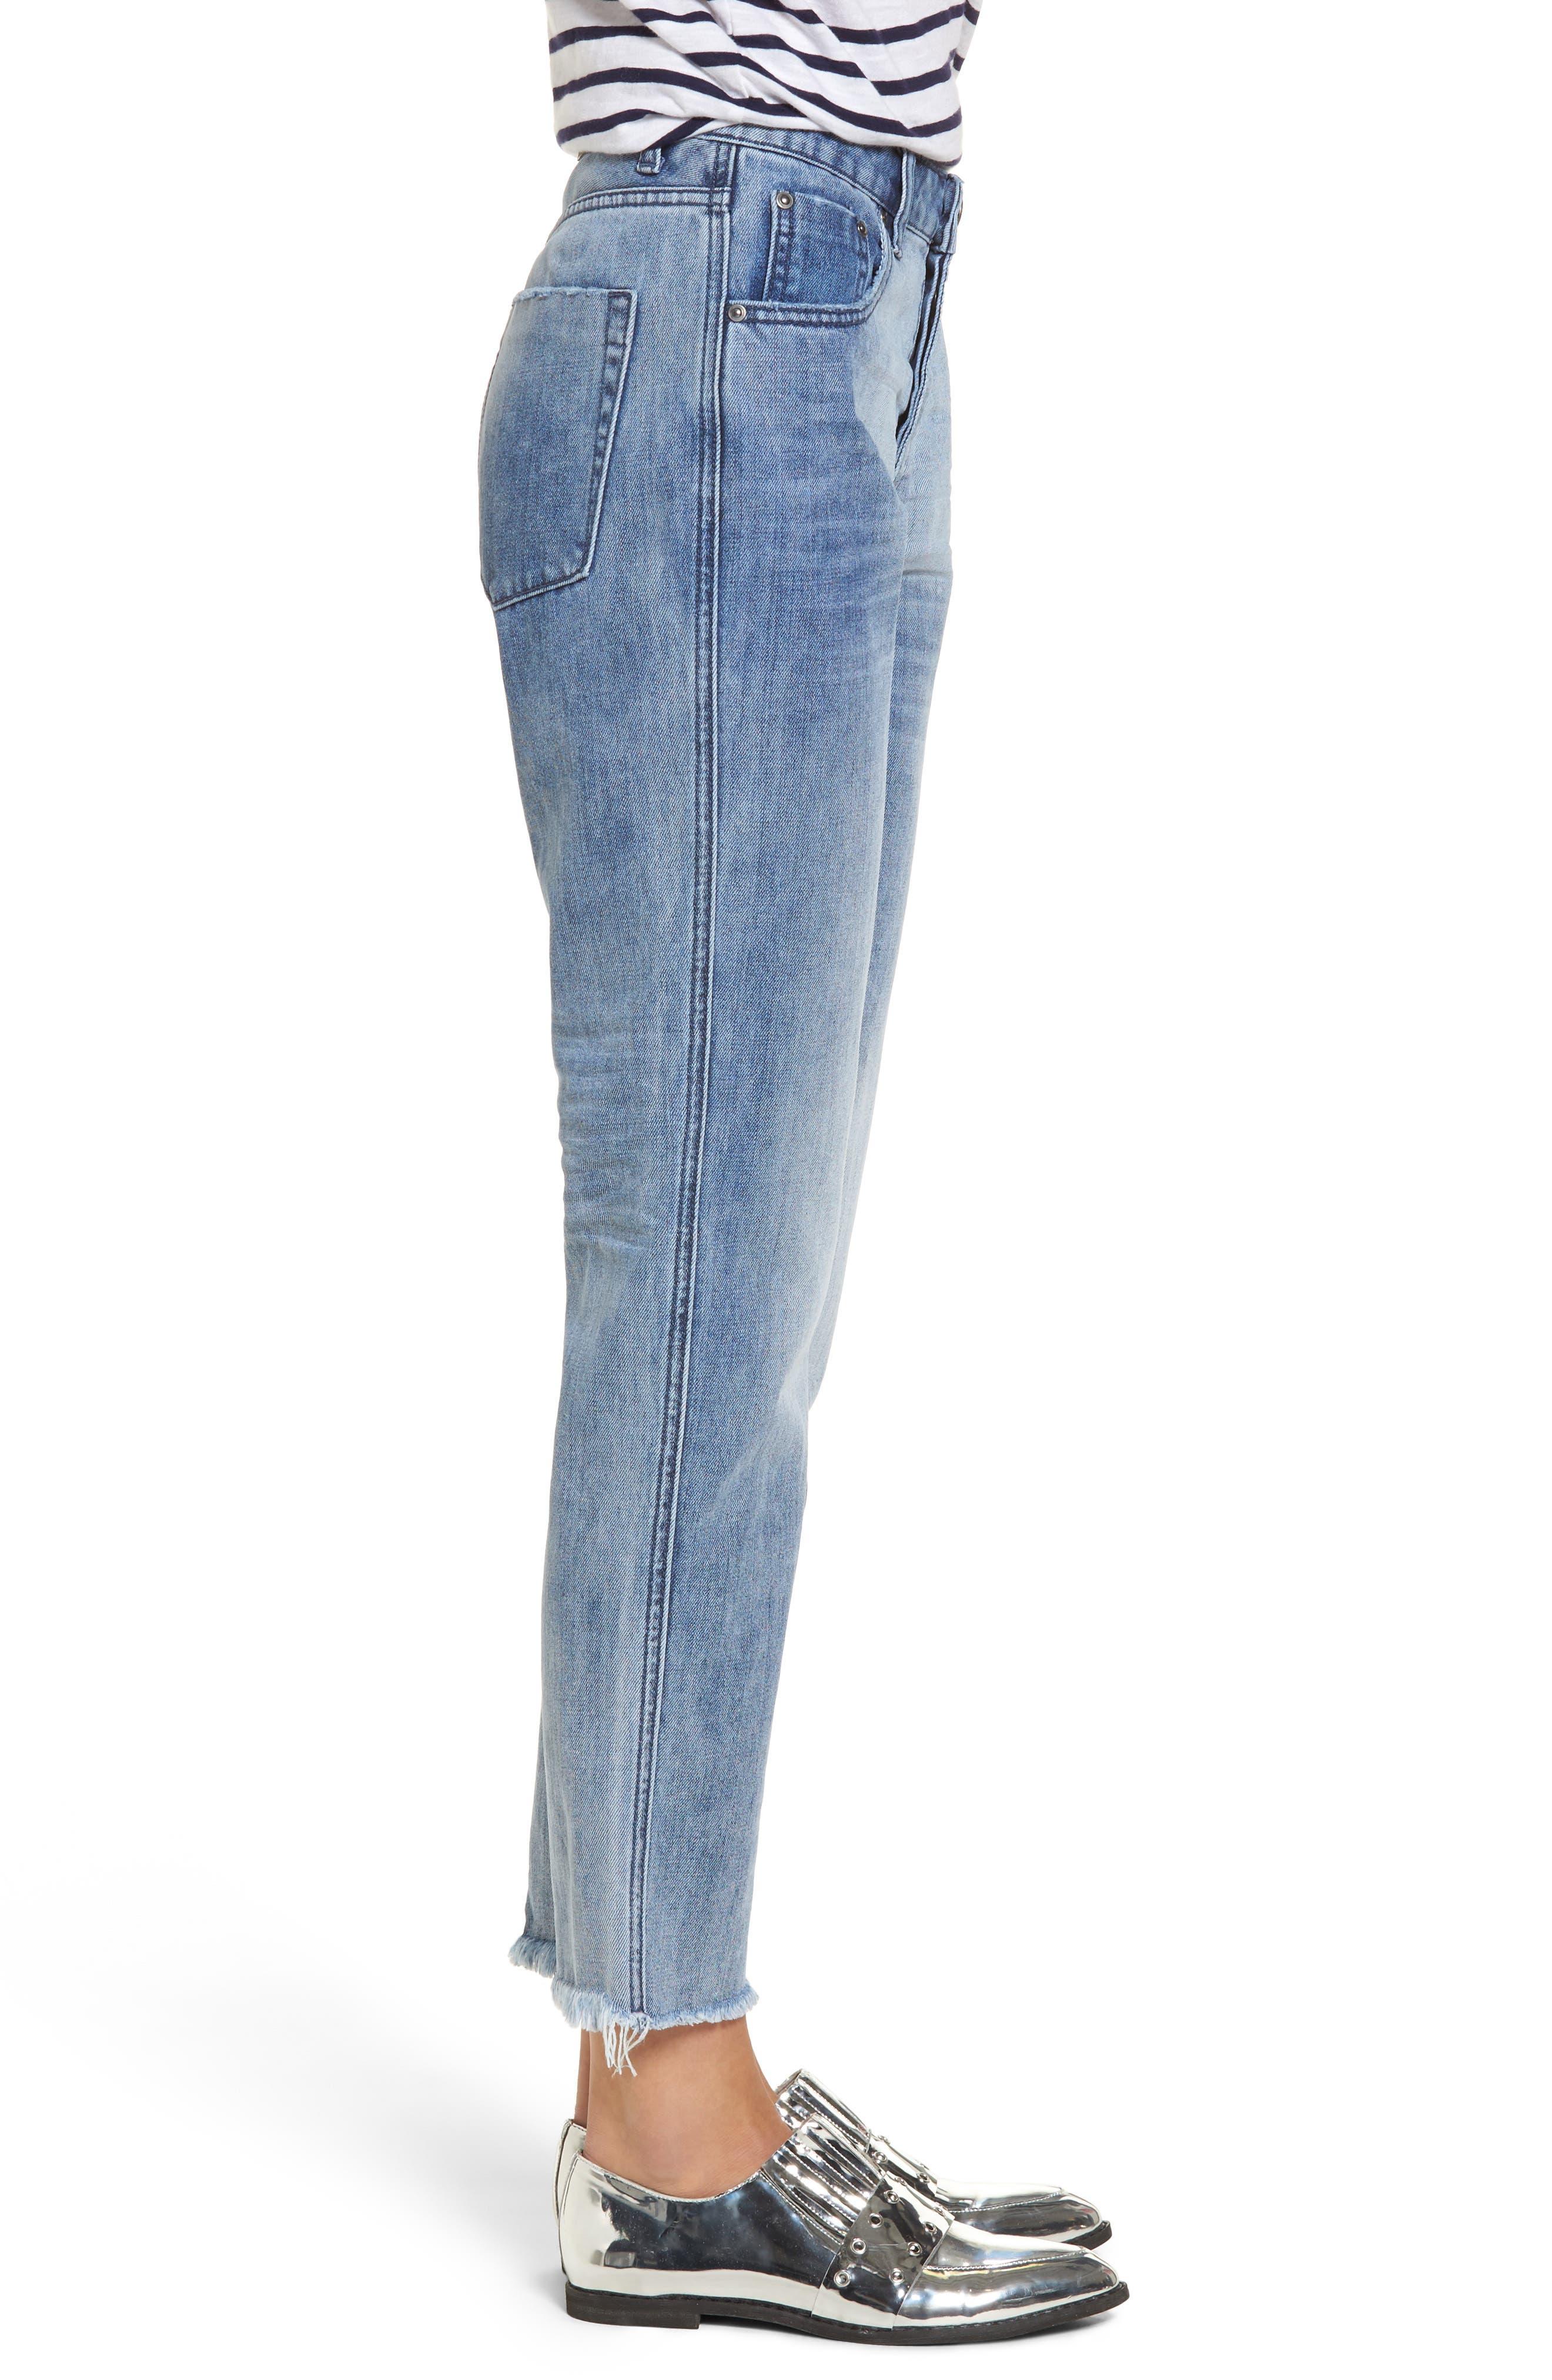 Tuckers High Waist Straight Leg Jeans,                             Alternate thumbnail 3, color,